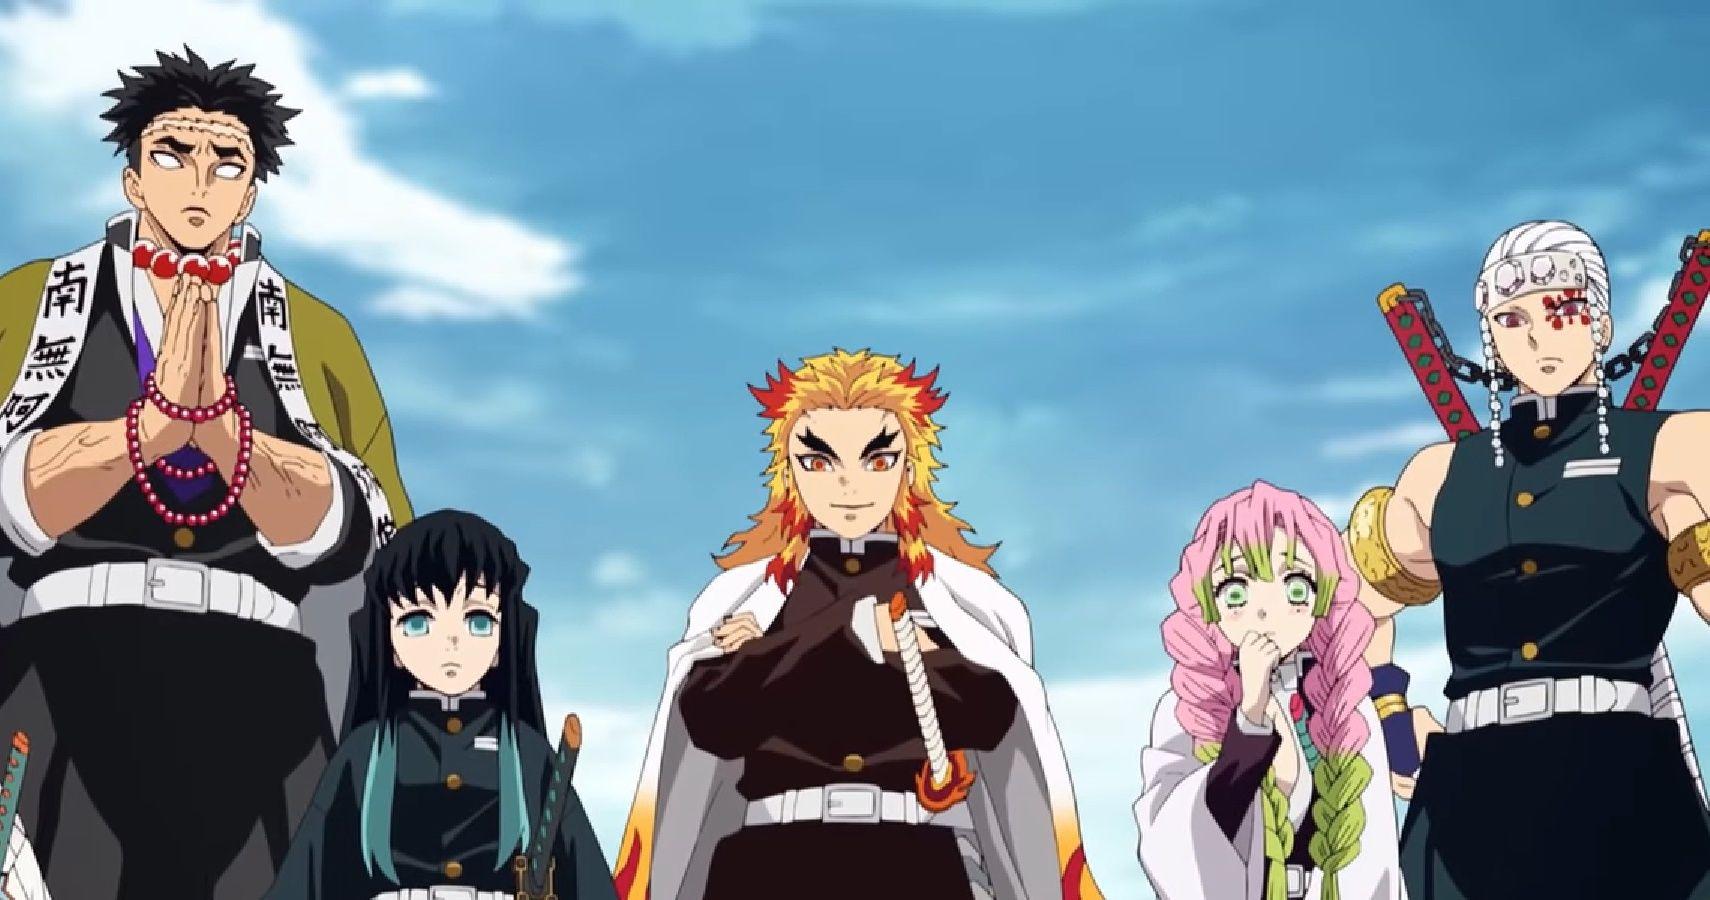 Demon Slayer Every Hashira Ranked According To Strength Cbr Mitsuri kanroji (甘 (かん) 露 (ろ) 寺 (じ) 蜜 (みつ) 璃 (り) kanroji mitsuri?) is a major supporting character of demon slayer: demon slayer every hashira ranked